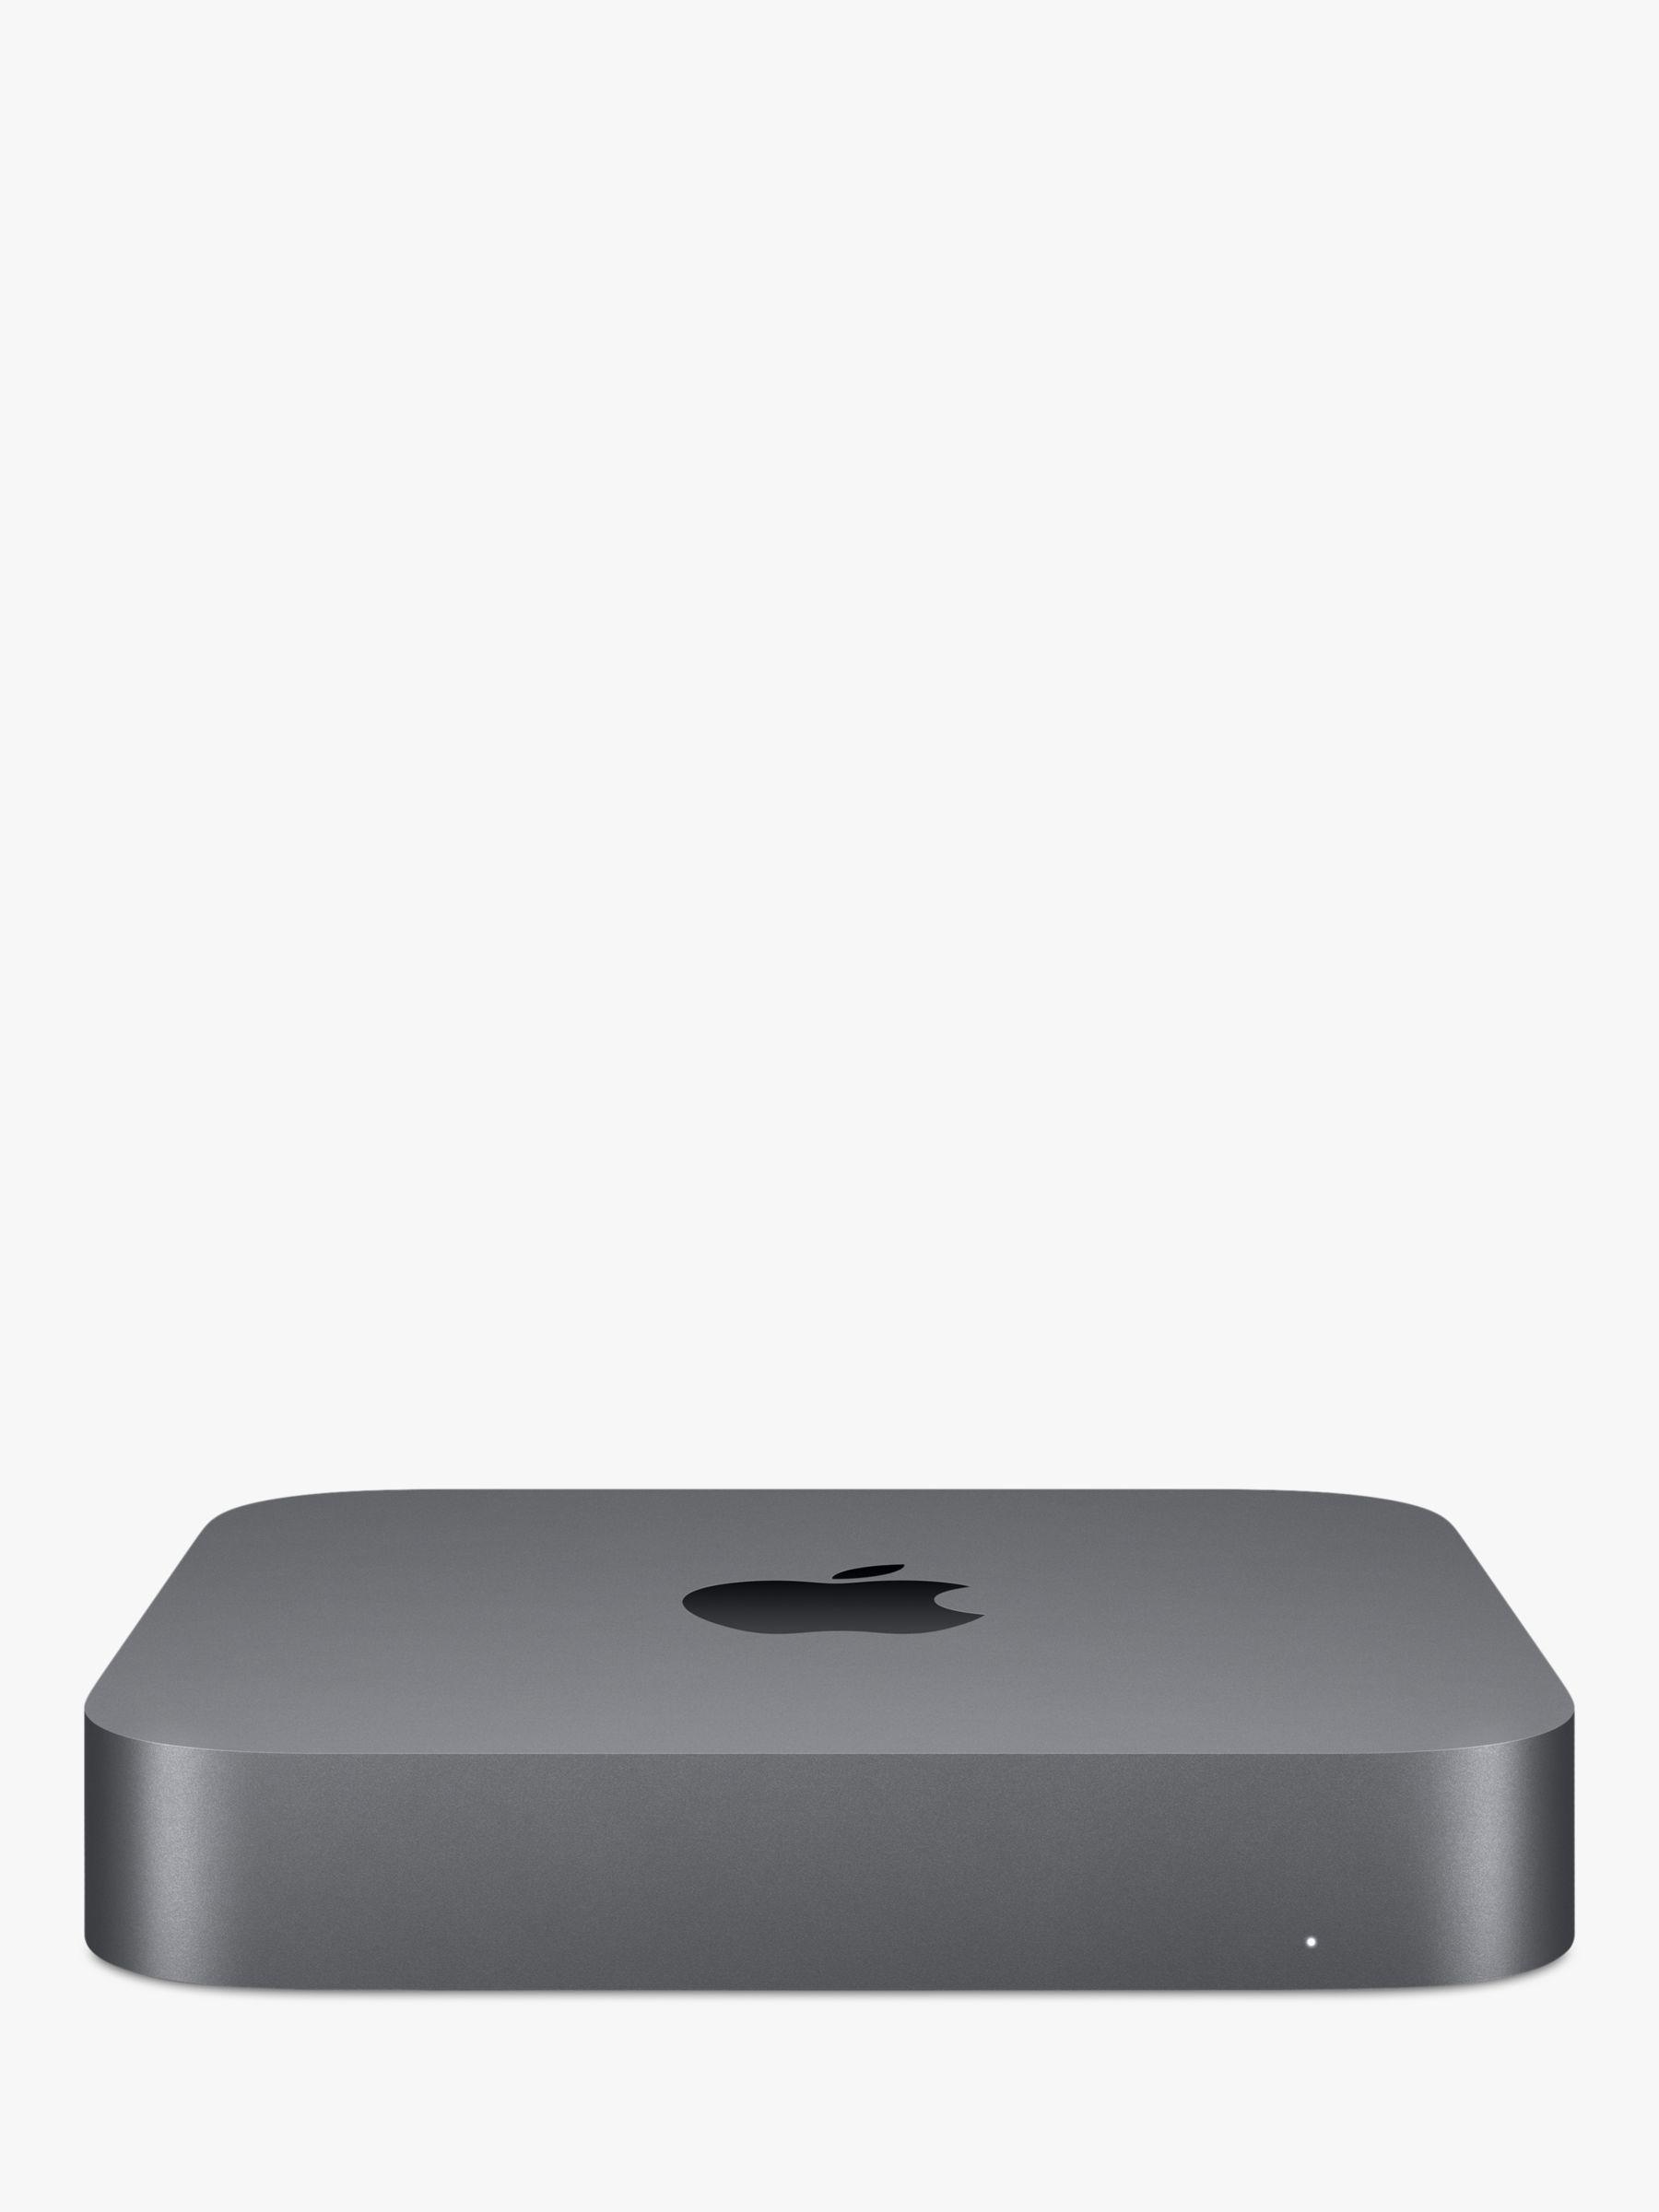 Apple Mac mini 2020 Desktop Computer, Intel Core i3, 8GB RAM, 256GB SSD, Space Grey